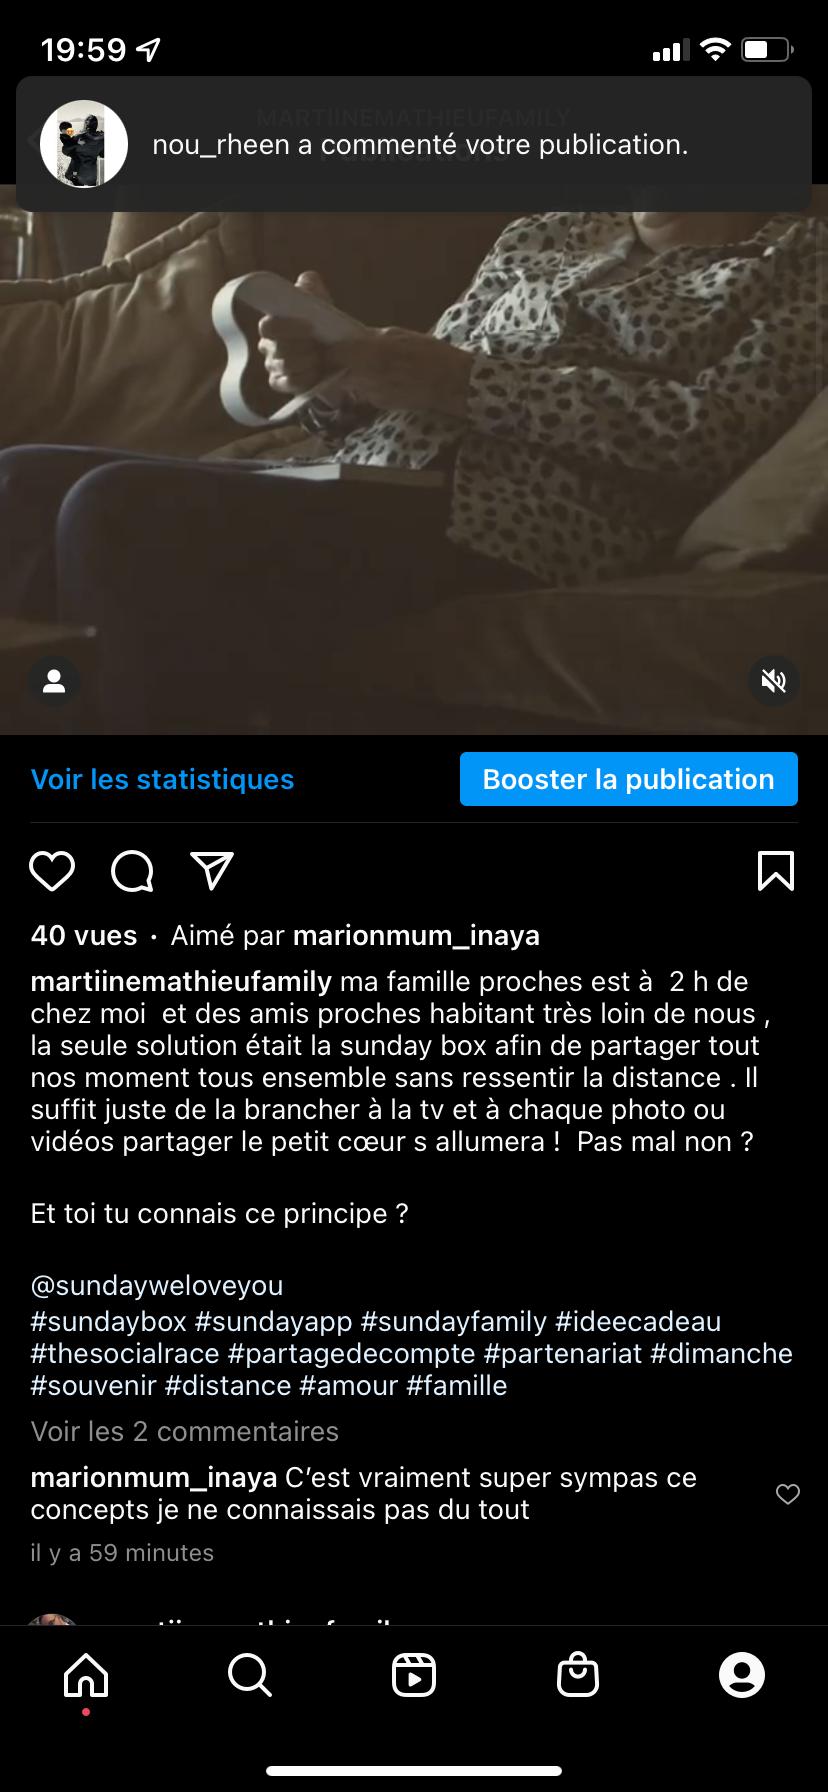 FRANCE: Promotion Sunday Box